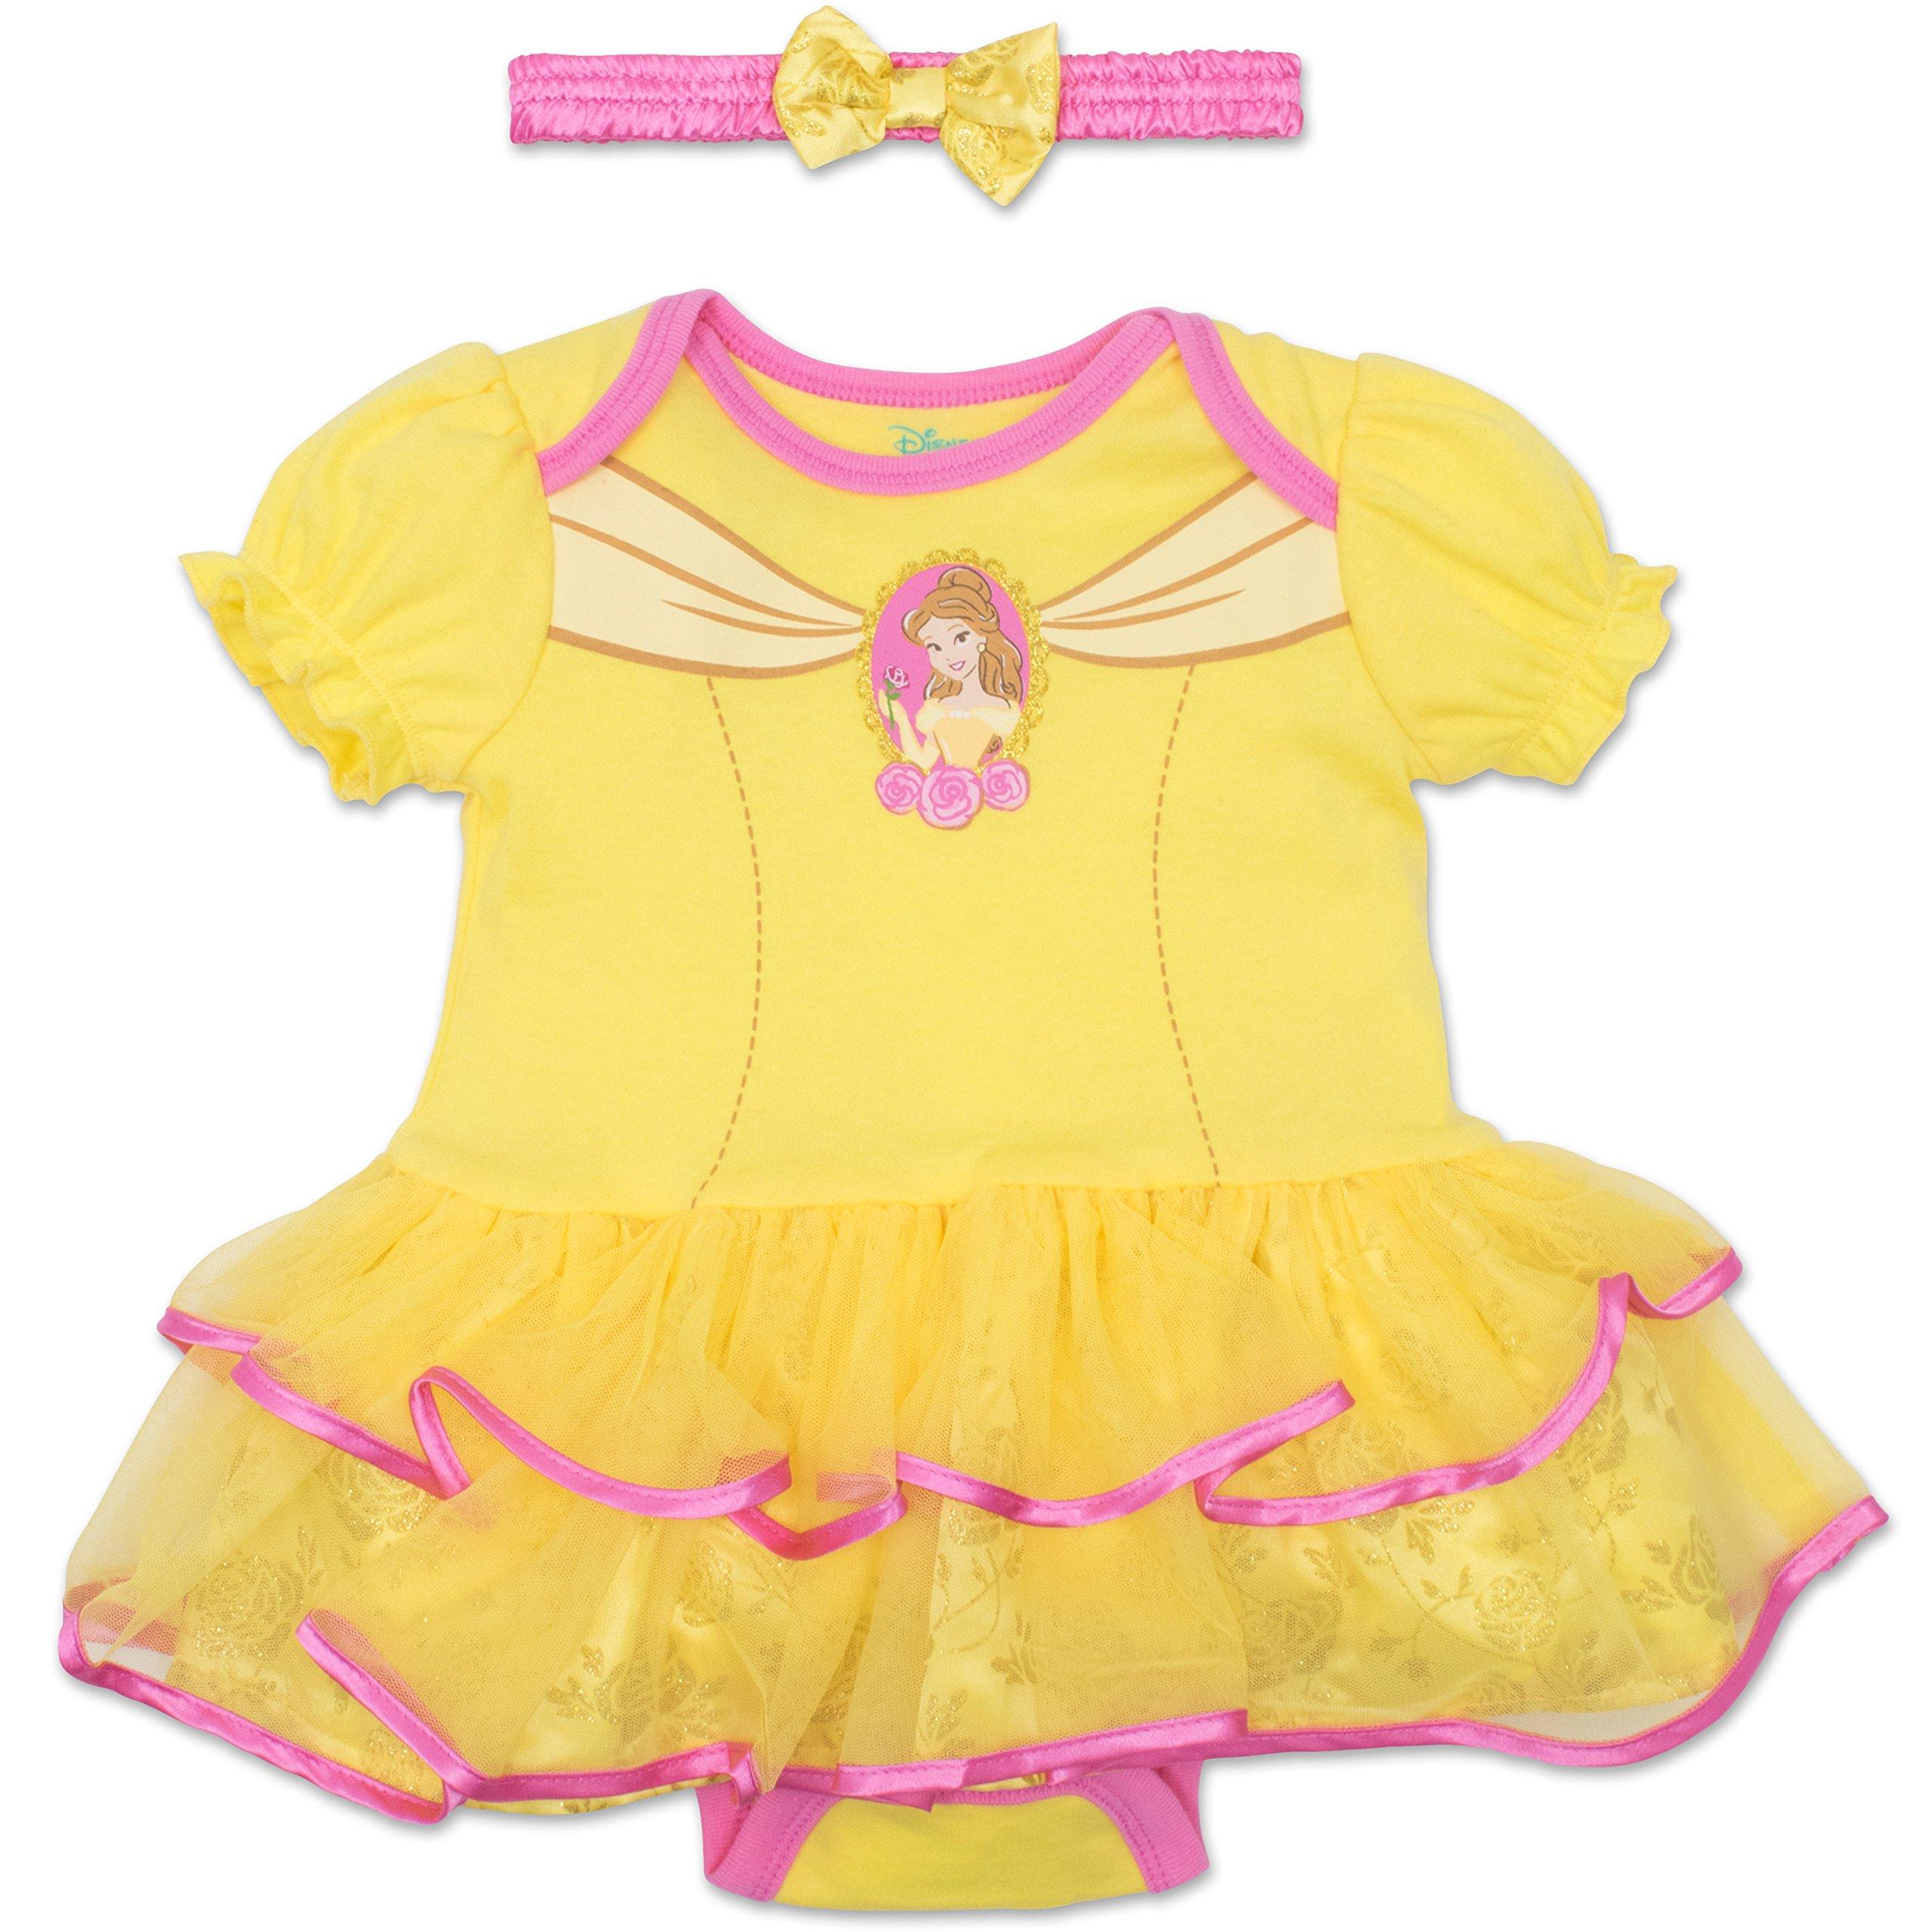 b6f71d7ba Get Quotations · Disney Princess Belle Baby Girls' Costume Tutu Dress  Bodysuit and Headband - Yellow